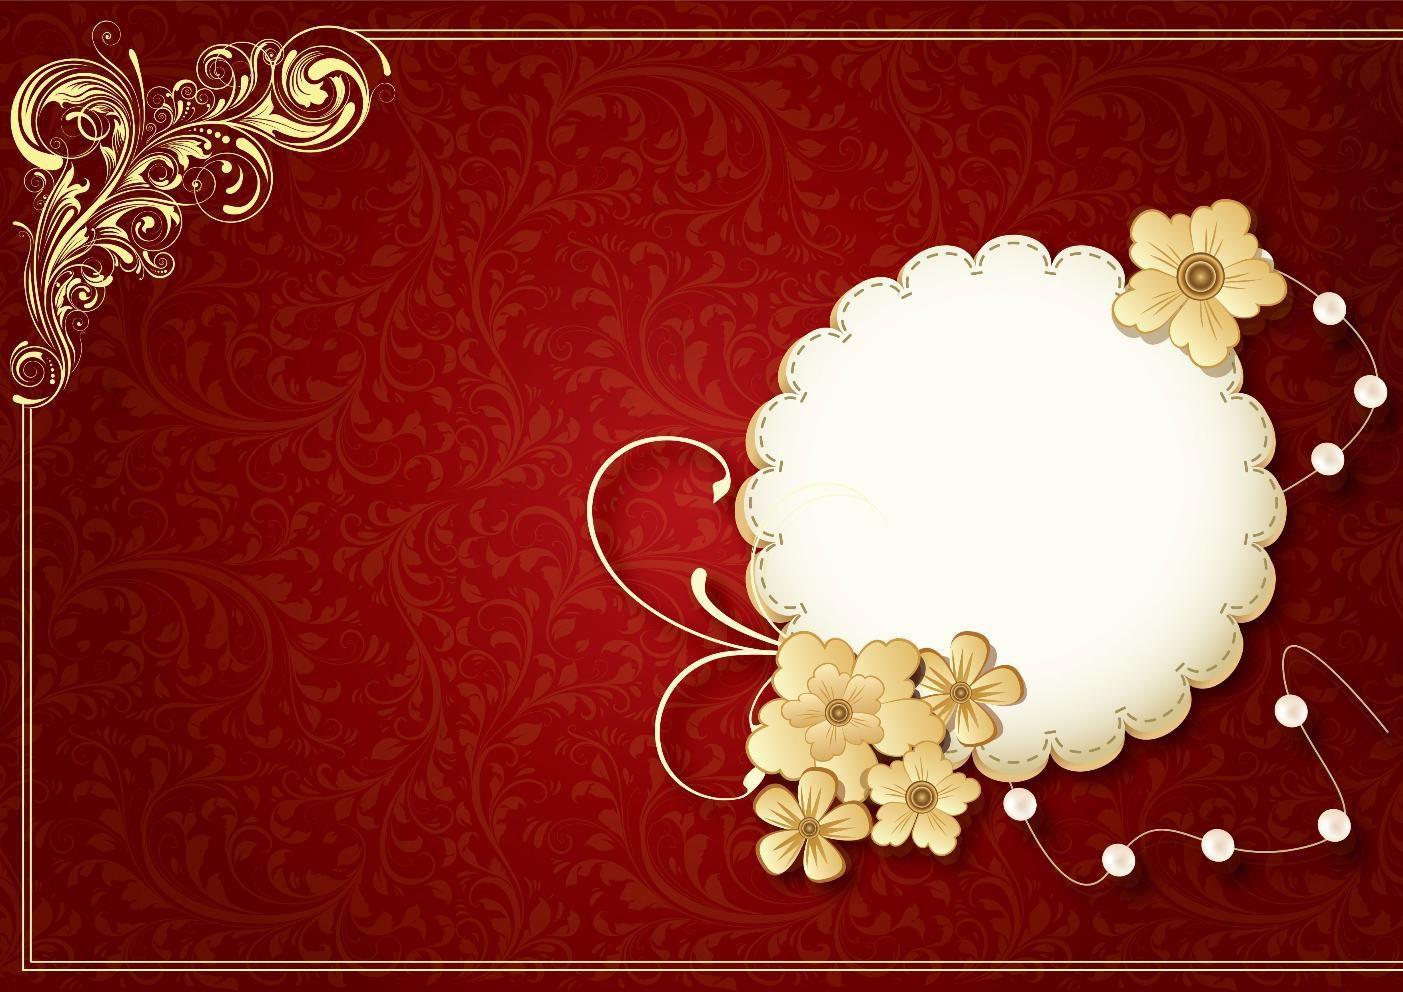 wedding invitation card design online Invitations card